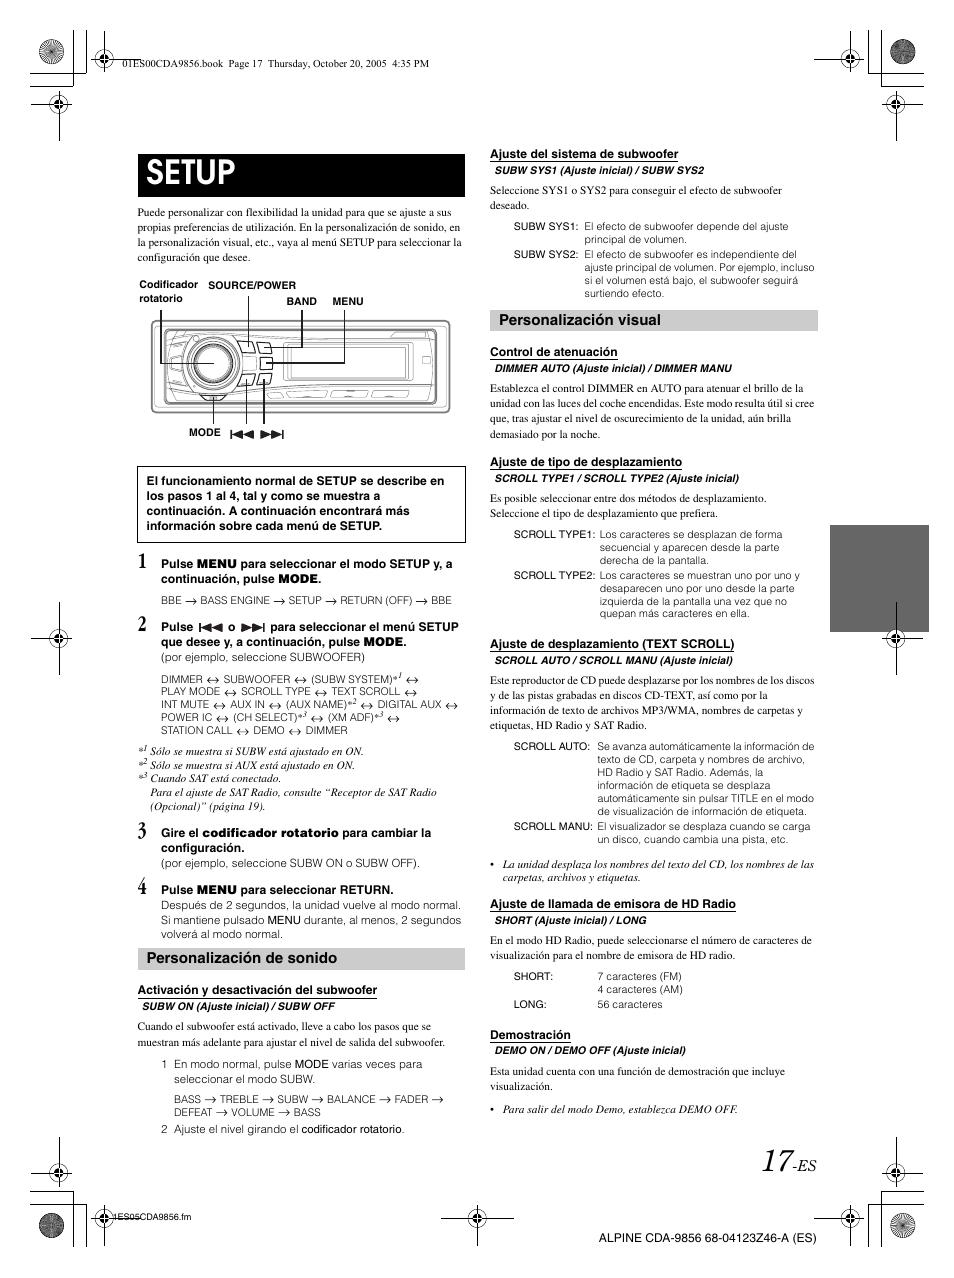 setup personalizaci n de sonido personalizaci n visual alpine rh manualsdir com Alpine CDA 9856 iPod Cable Alpine CDA- 9853